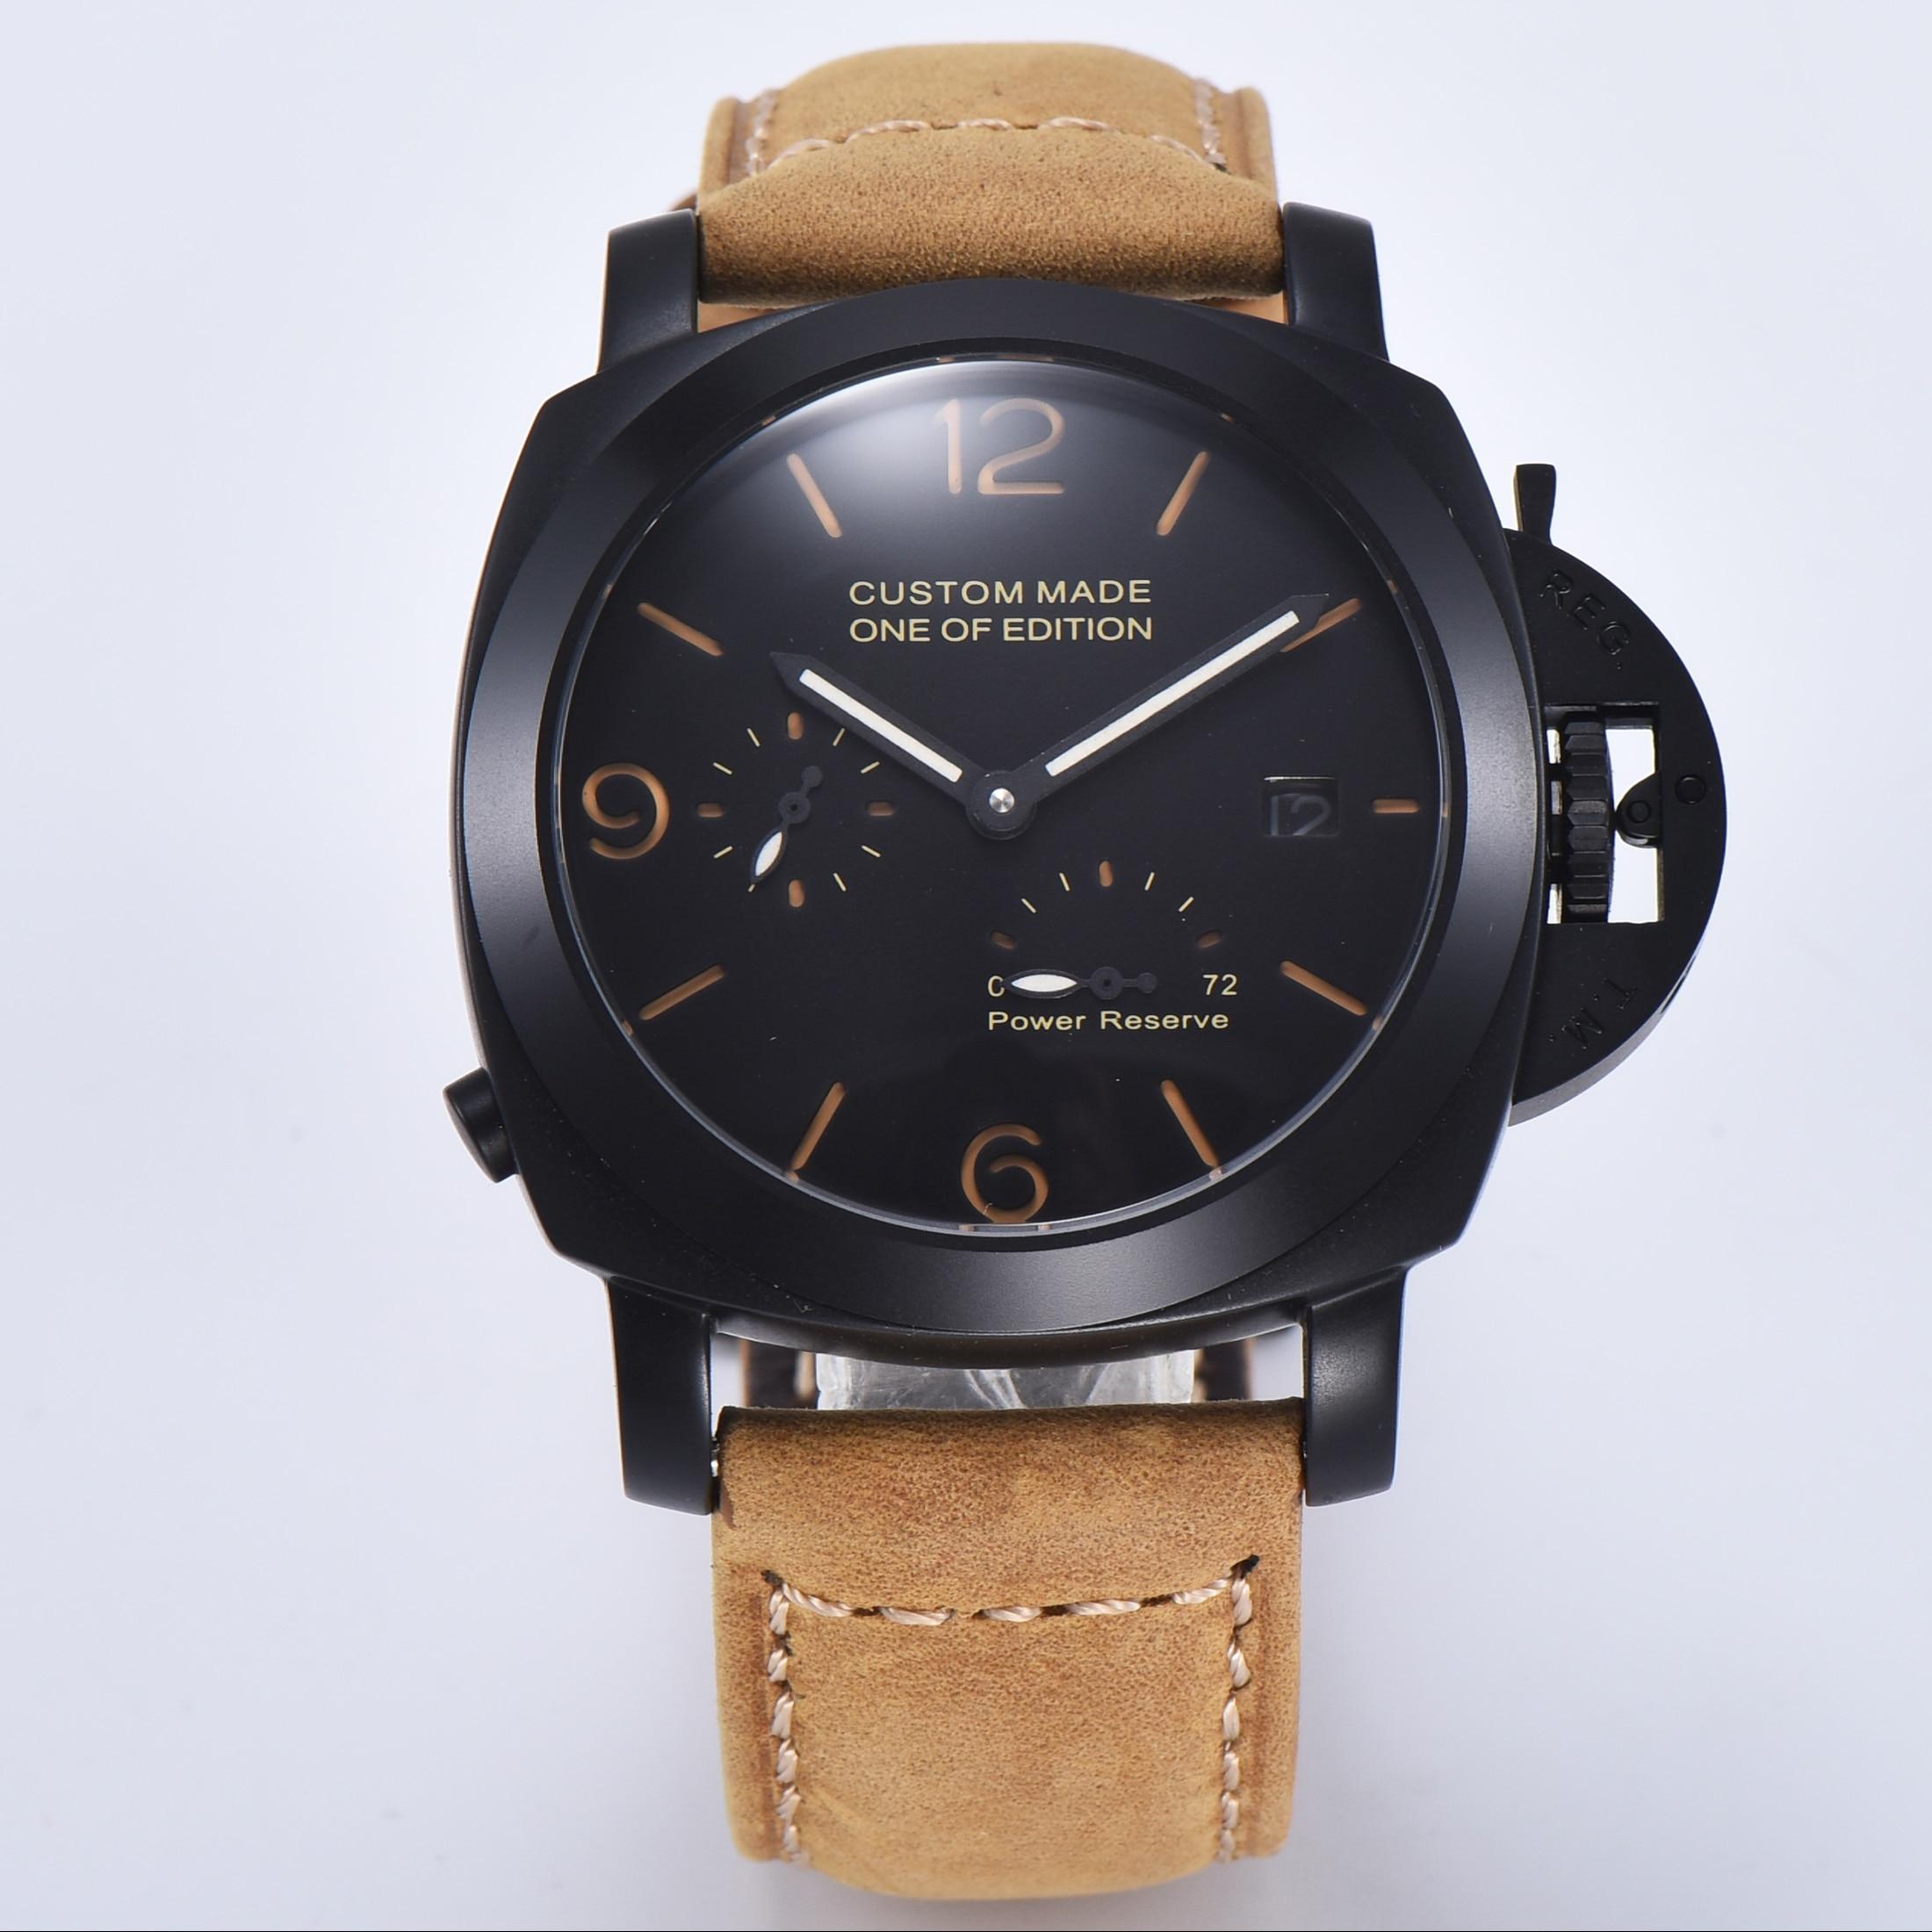 Reloj 44mm BOMAX MARINA militar movimiento automático luminoso calendario PVD Acero inoxidable caja A1